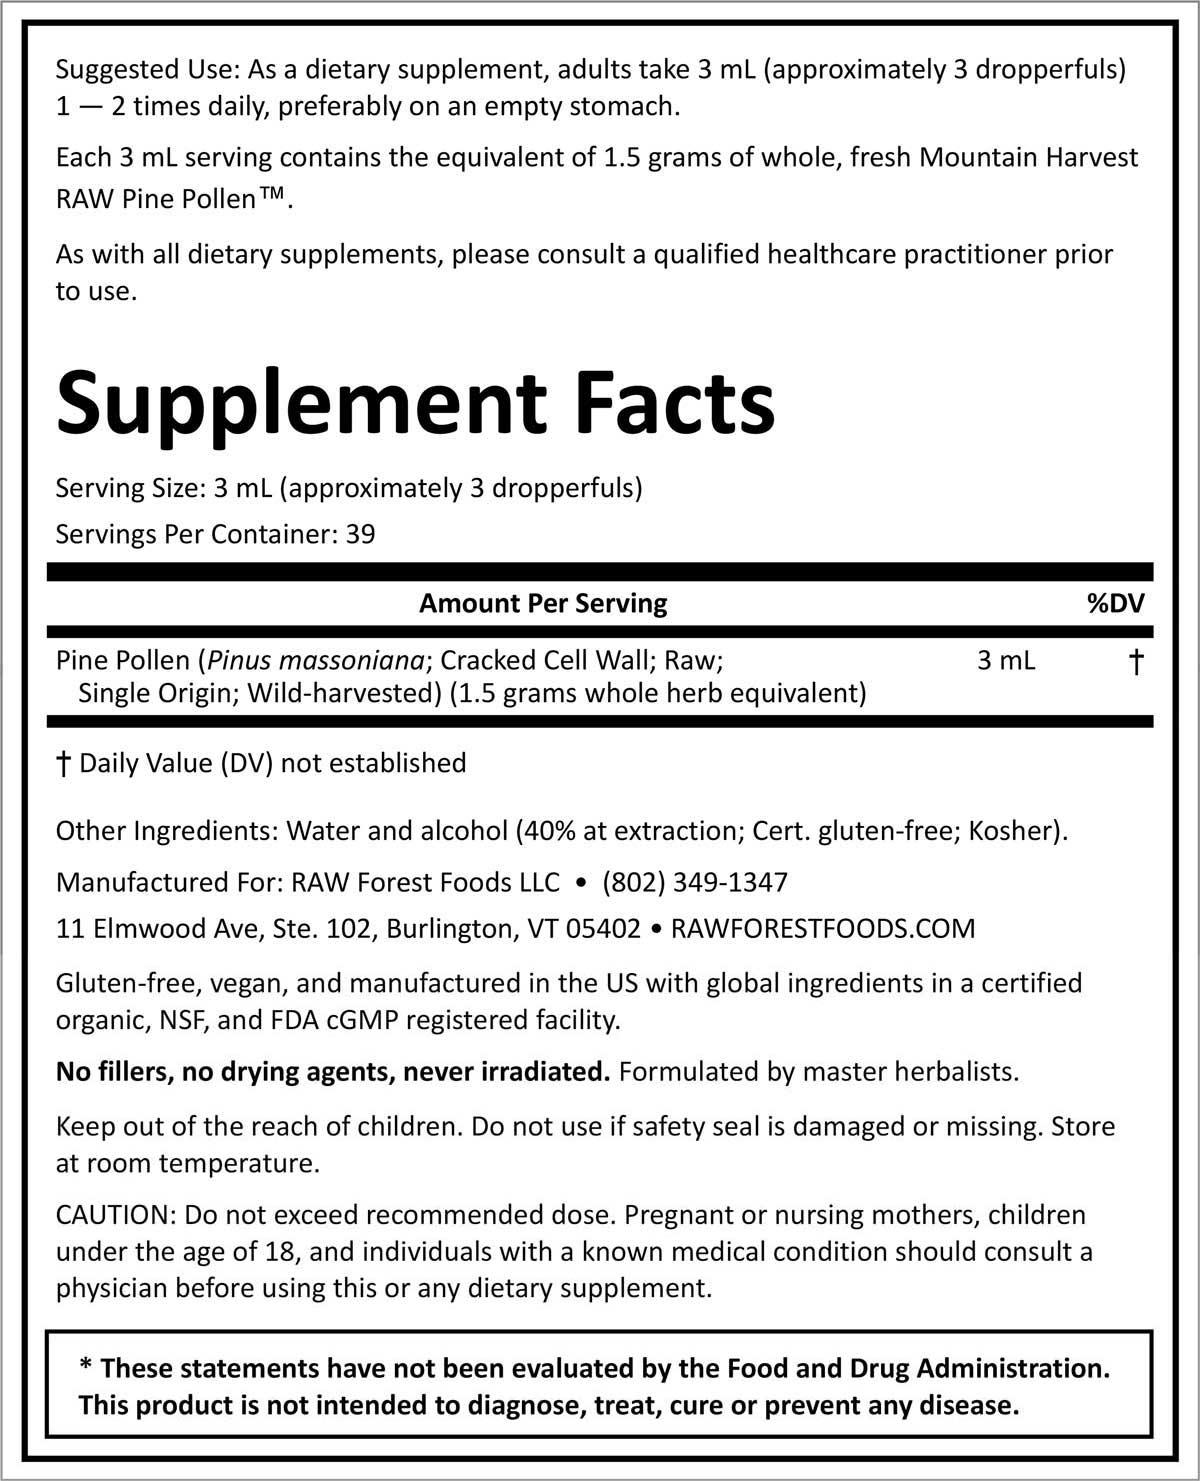 royal-pine-pollen-tincture-supplement-facts-4-ounce-1.jpg